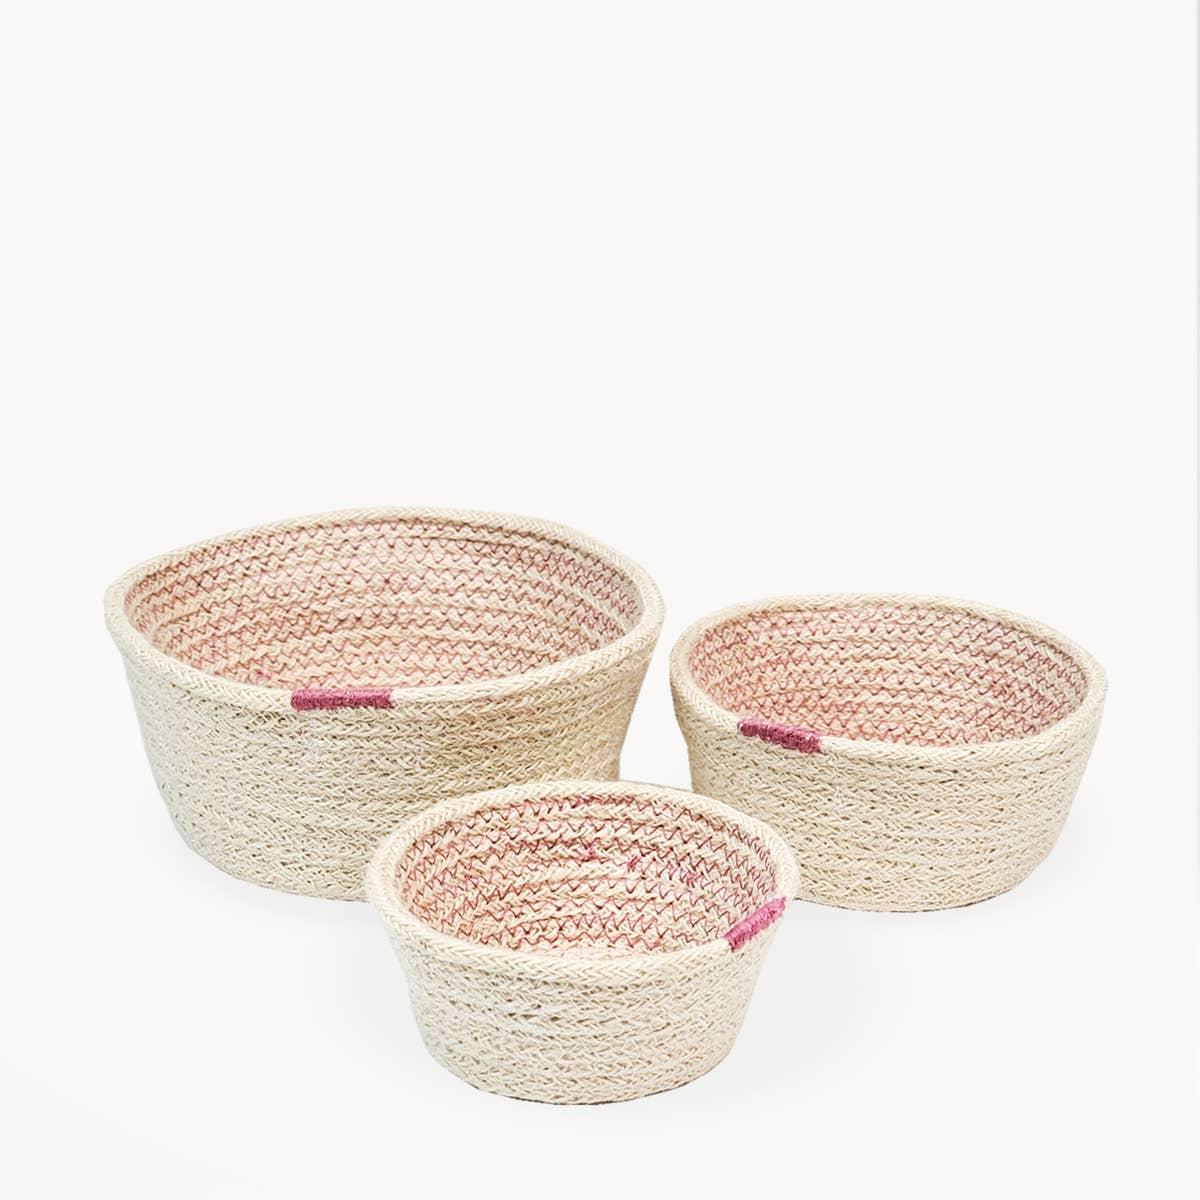 Amari Bowl - Pink (Set of 3) | Trada Marketplace